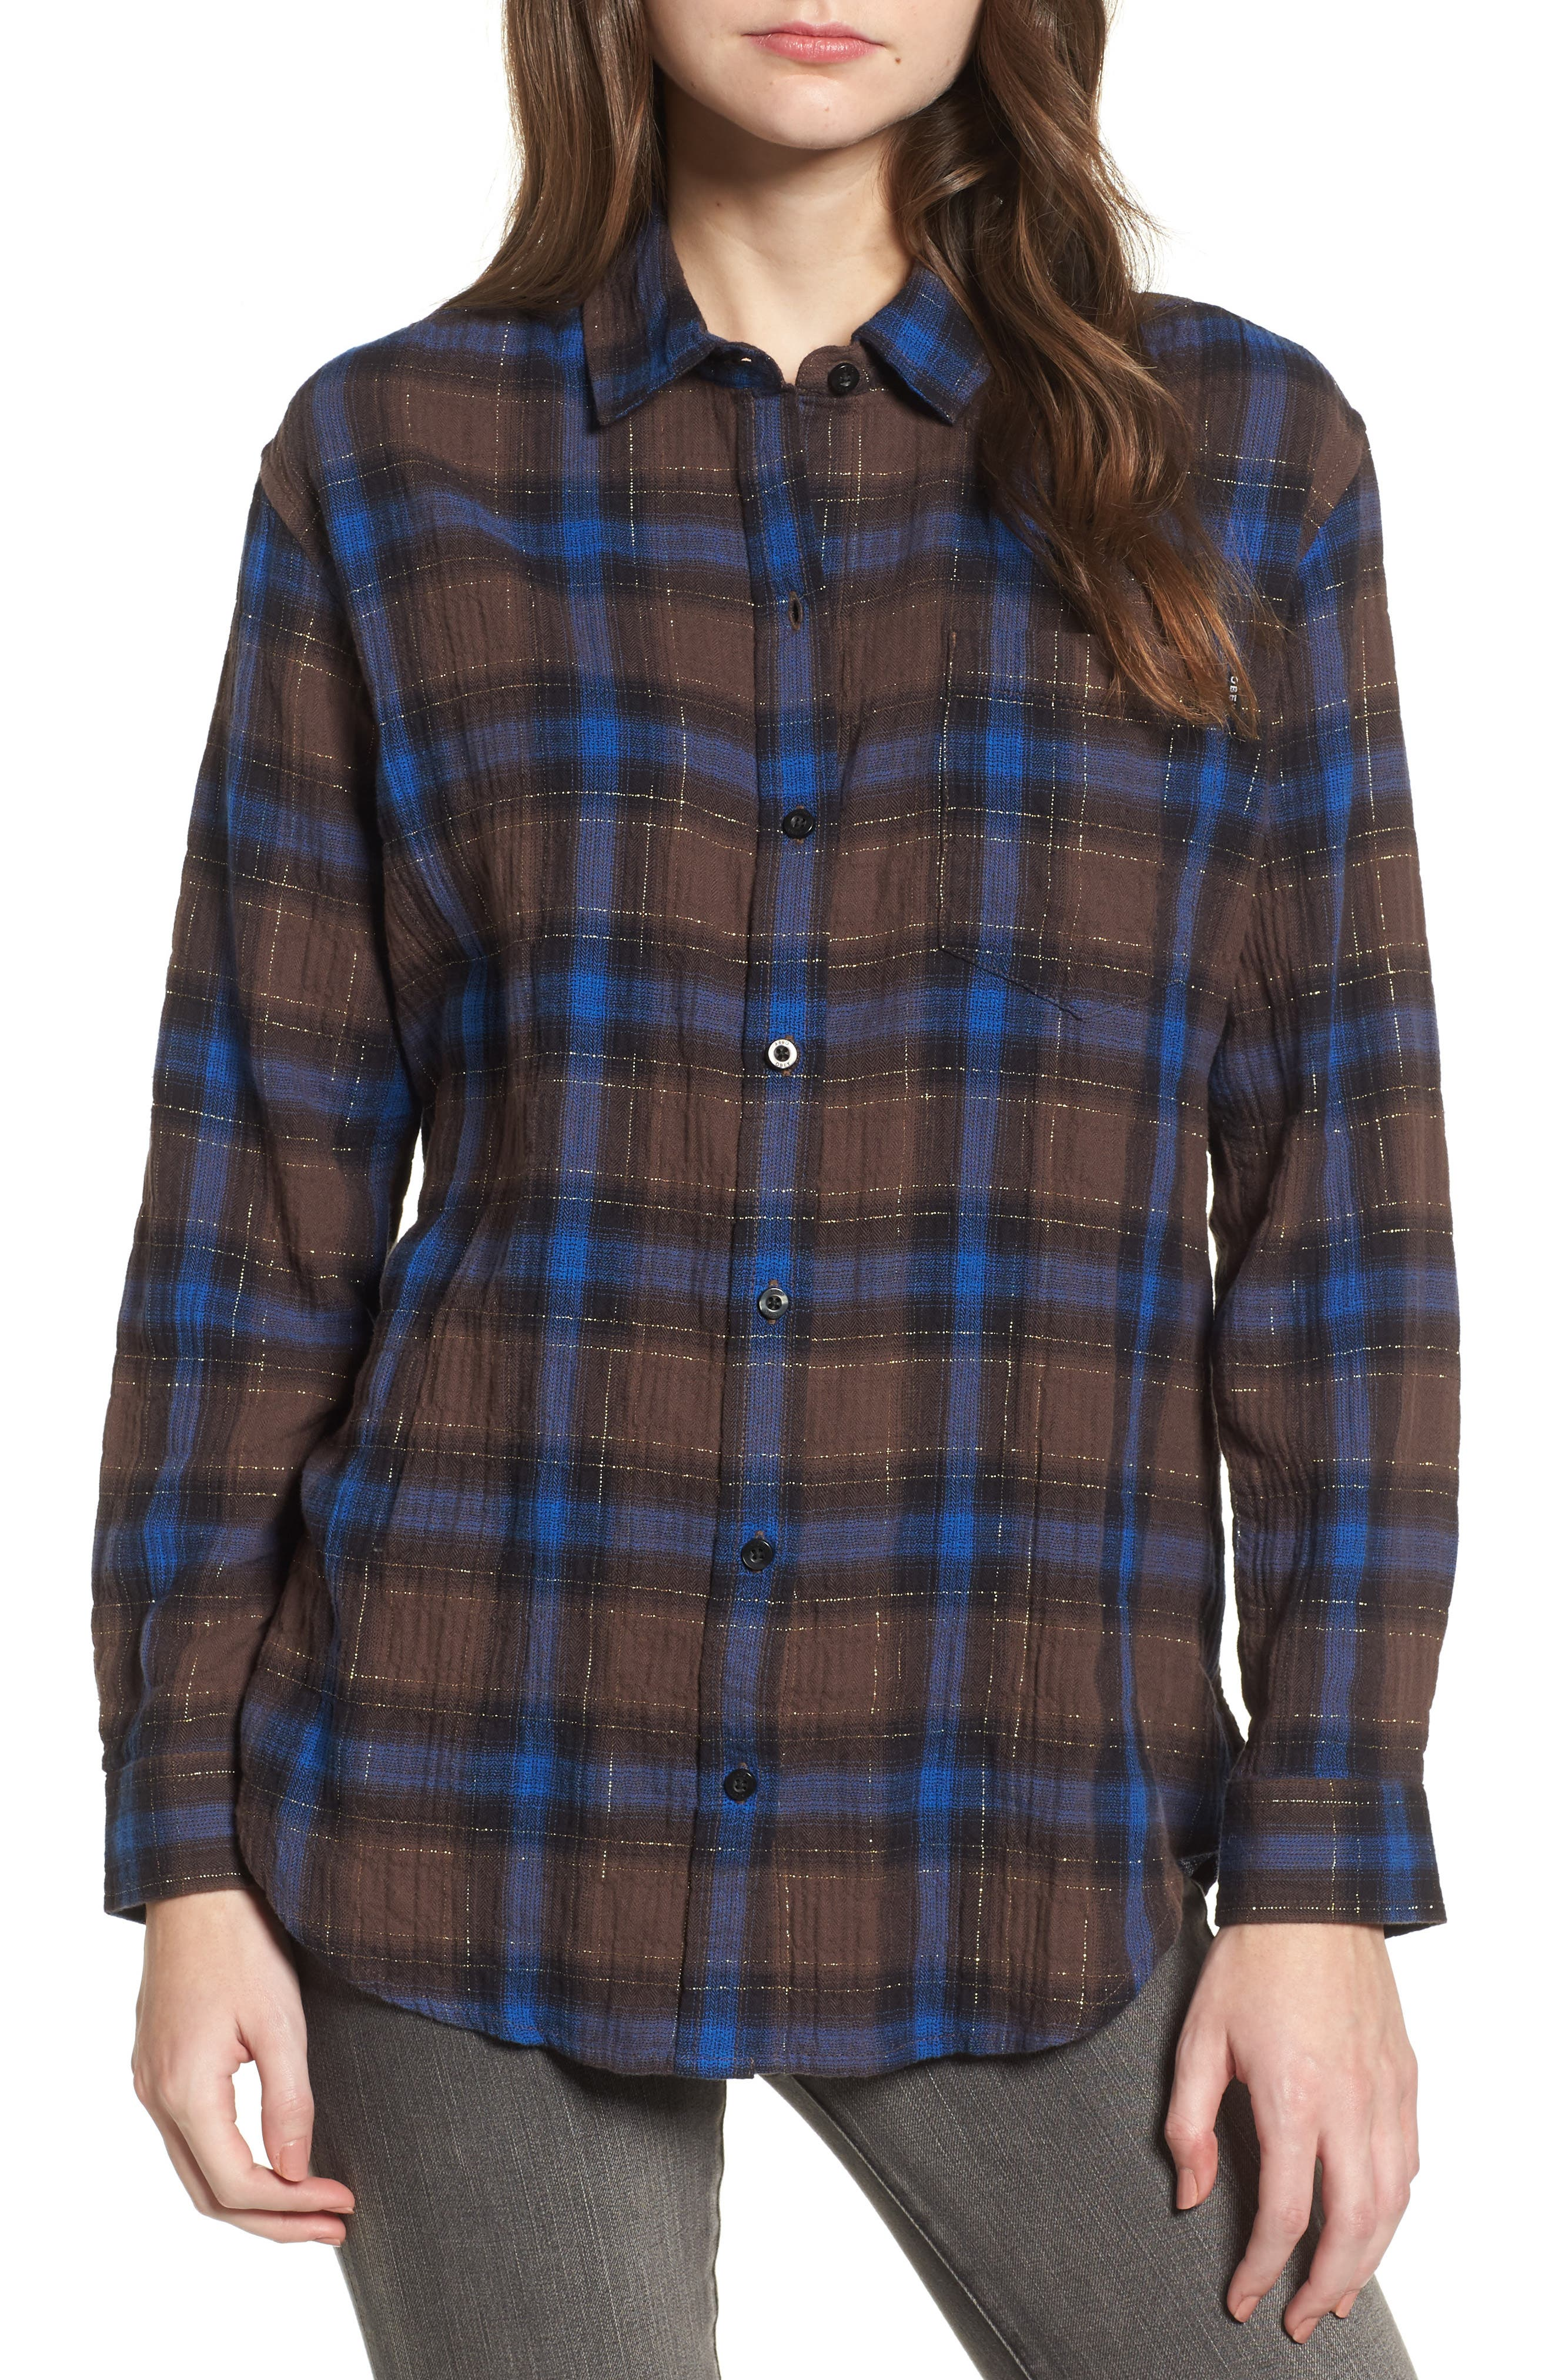 Eldorado Plaid Shirt,                             Main thumbnail 1, color,                             240